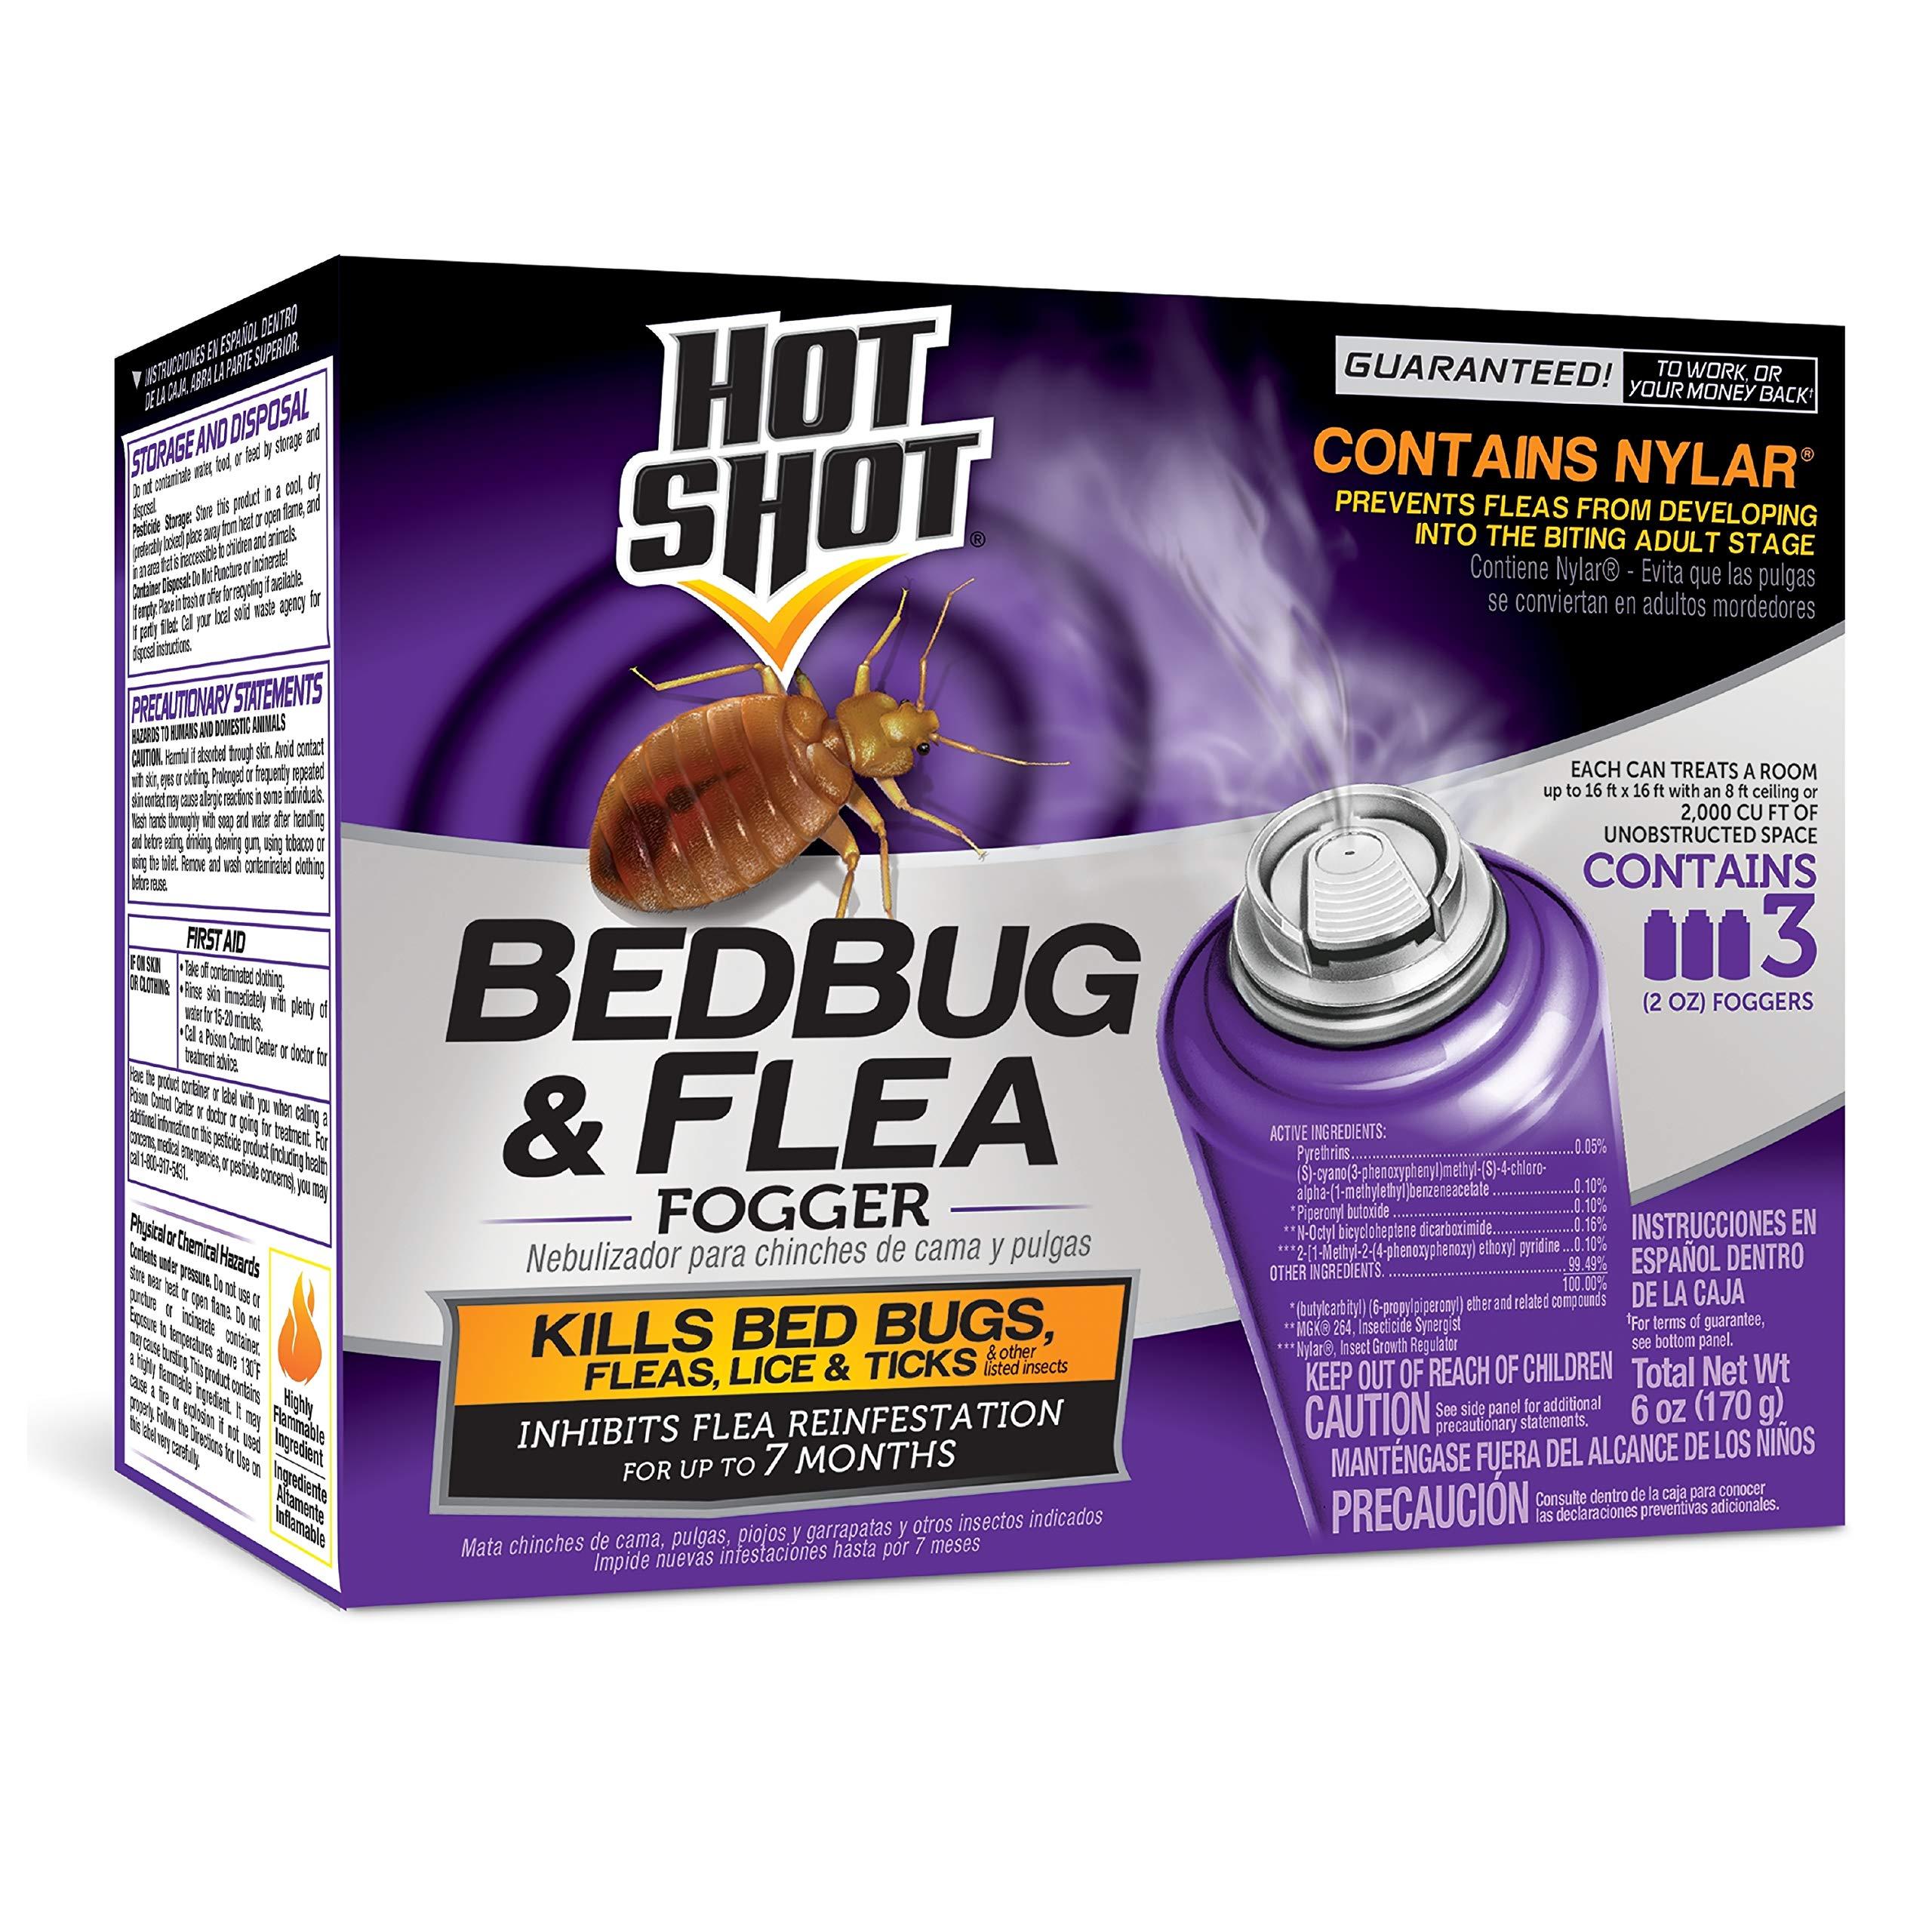 Hot Shot Bedbug Fogger 2 Ounce